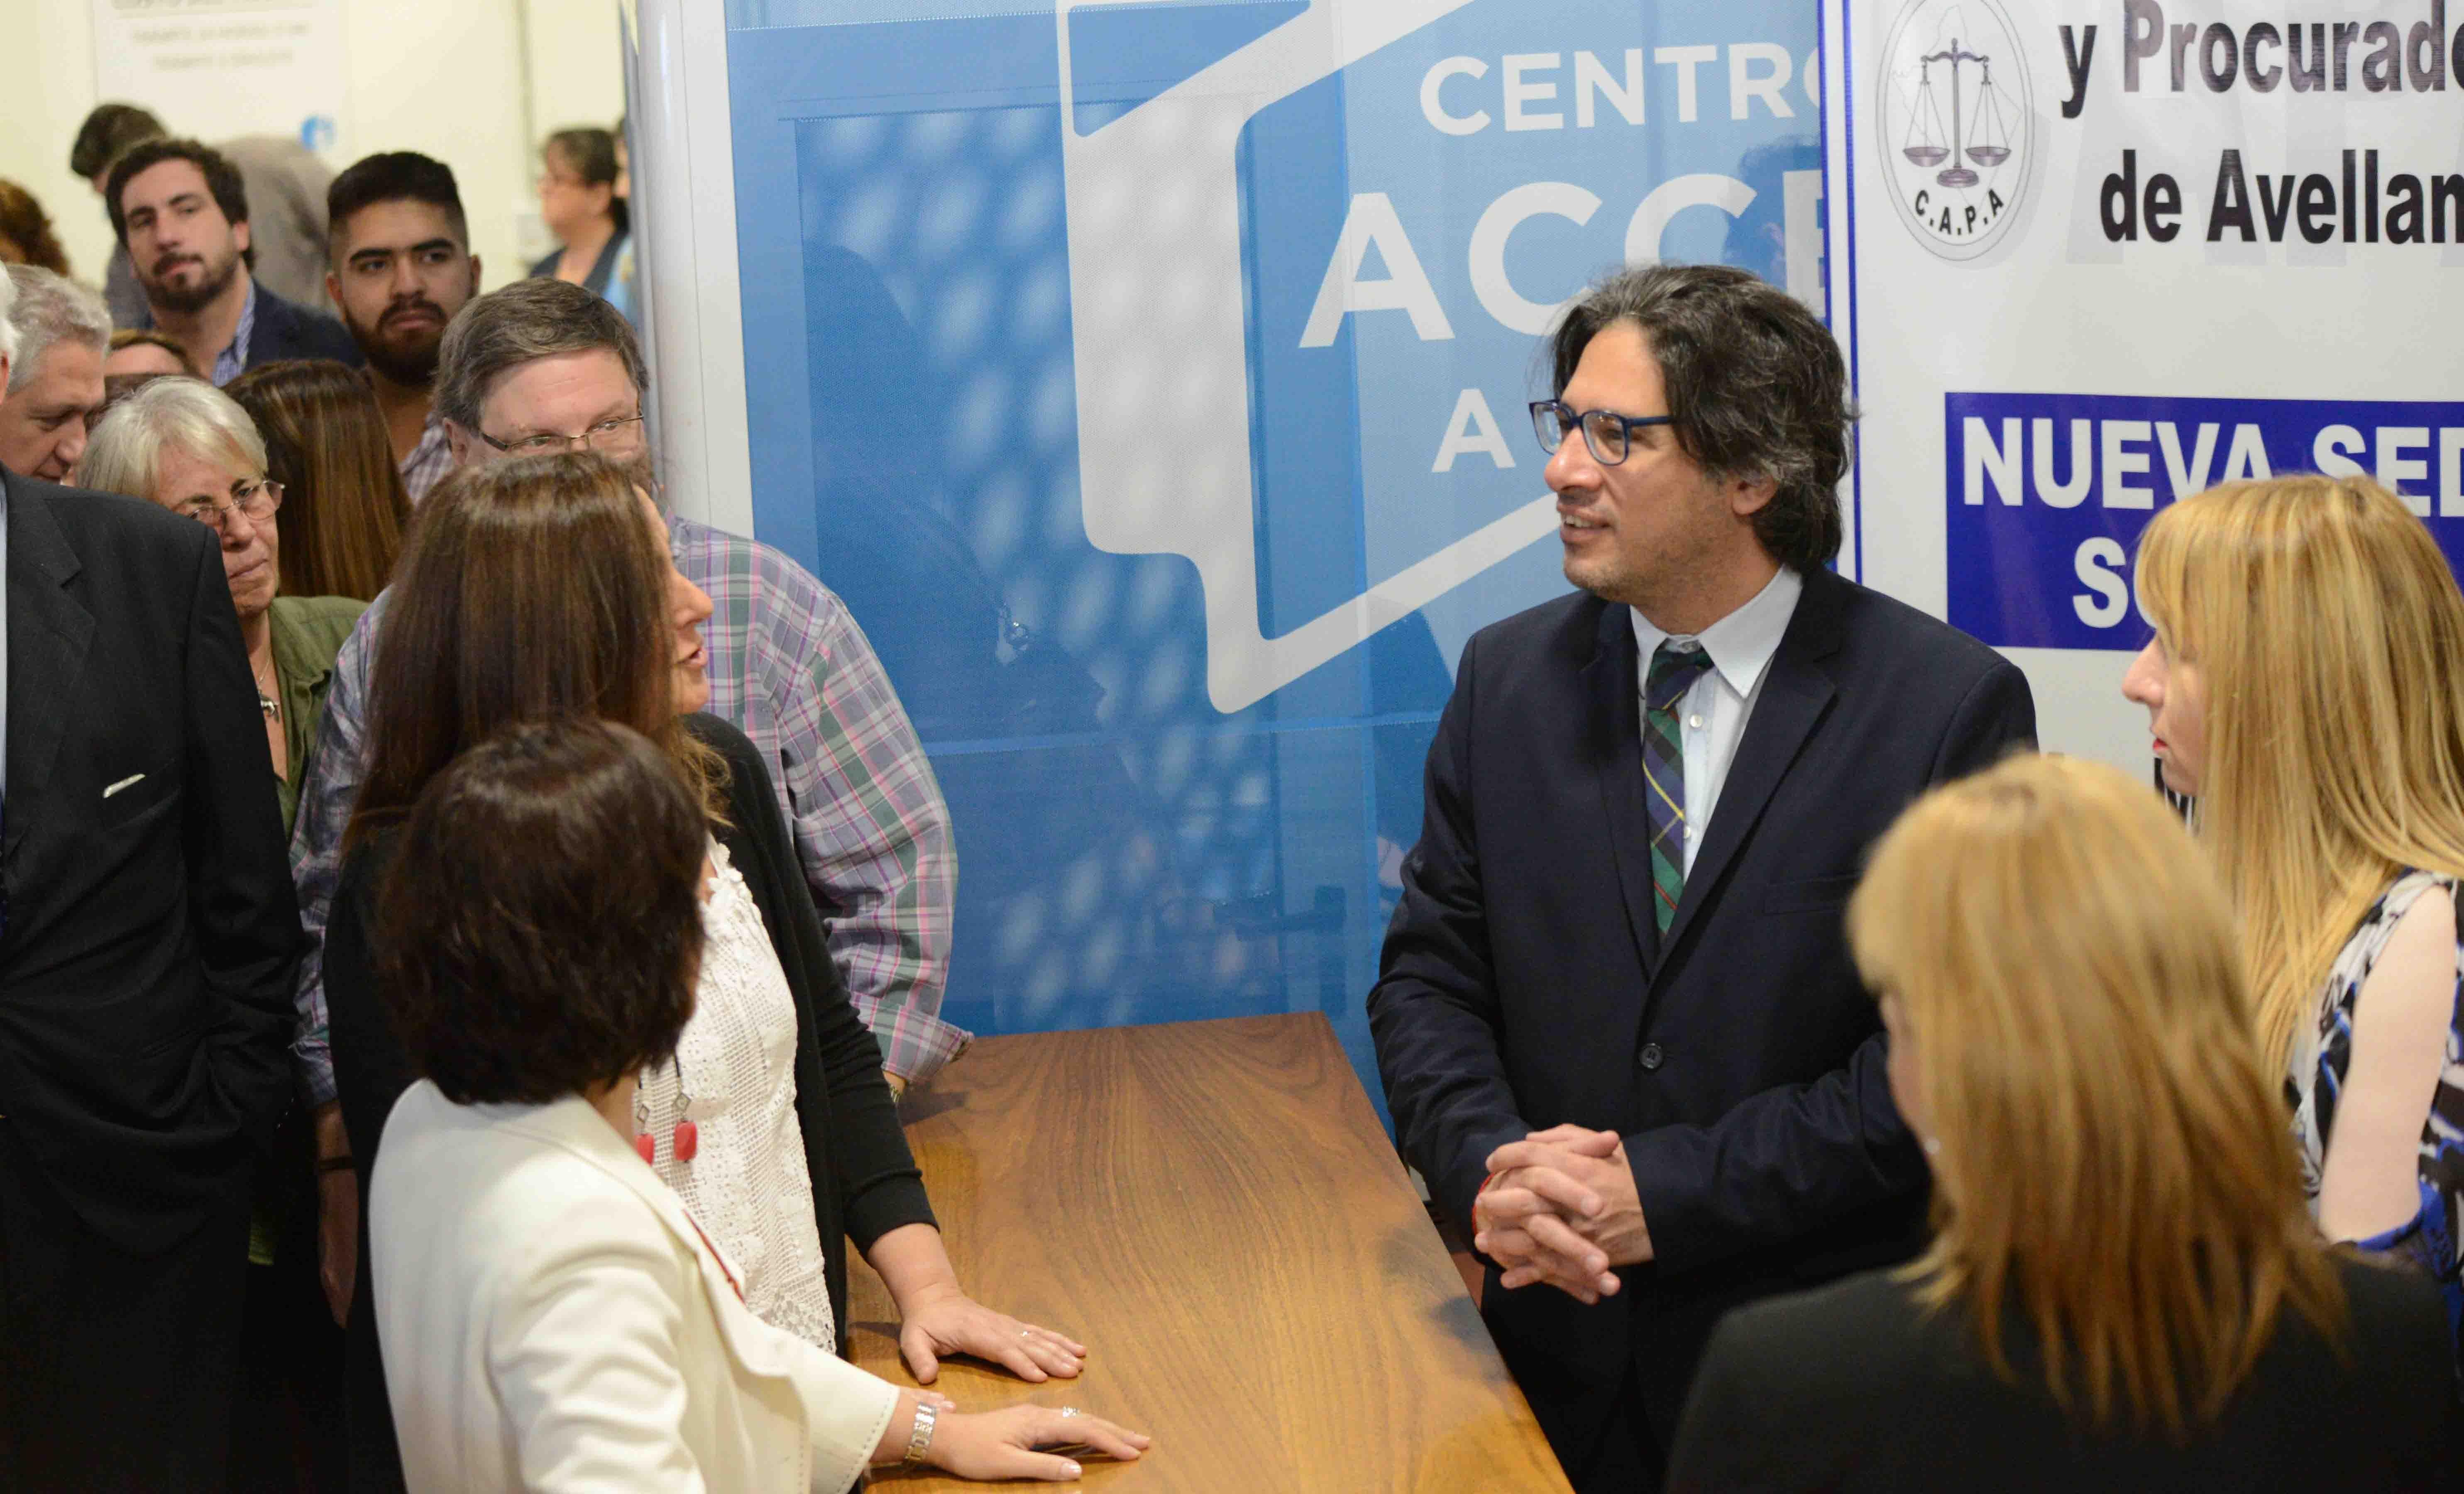 Se completa la Red federal de Centros de Acceso a Justicia (Avellaneda)